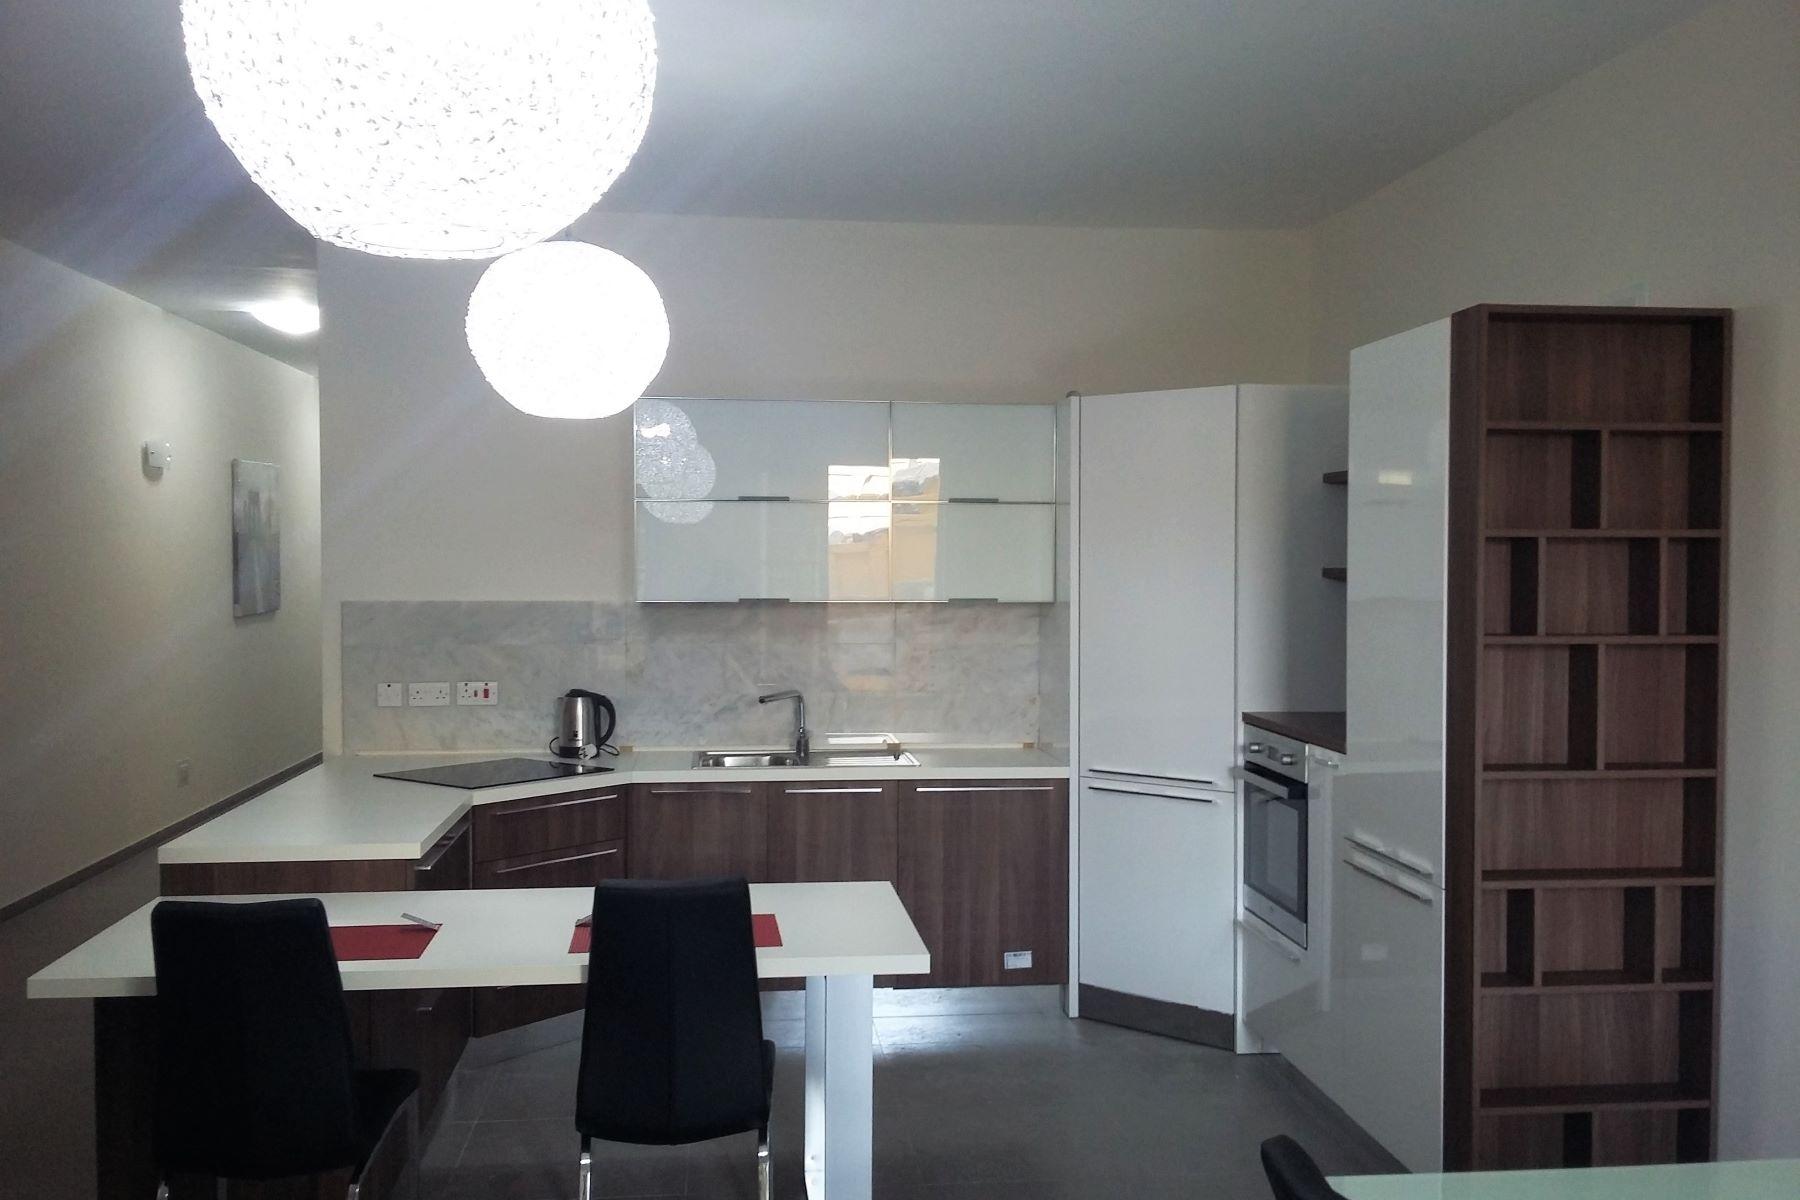 Single Family Home for Rent at Maisonette Apartment Swieqi, Malta